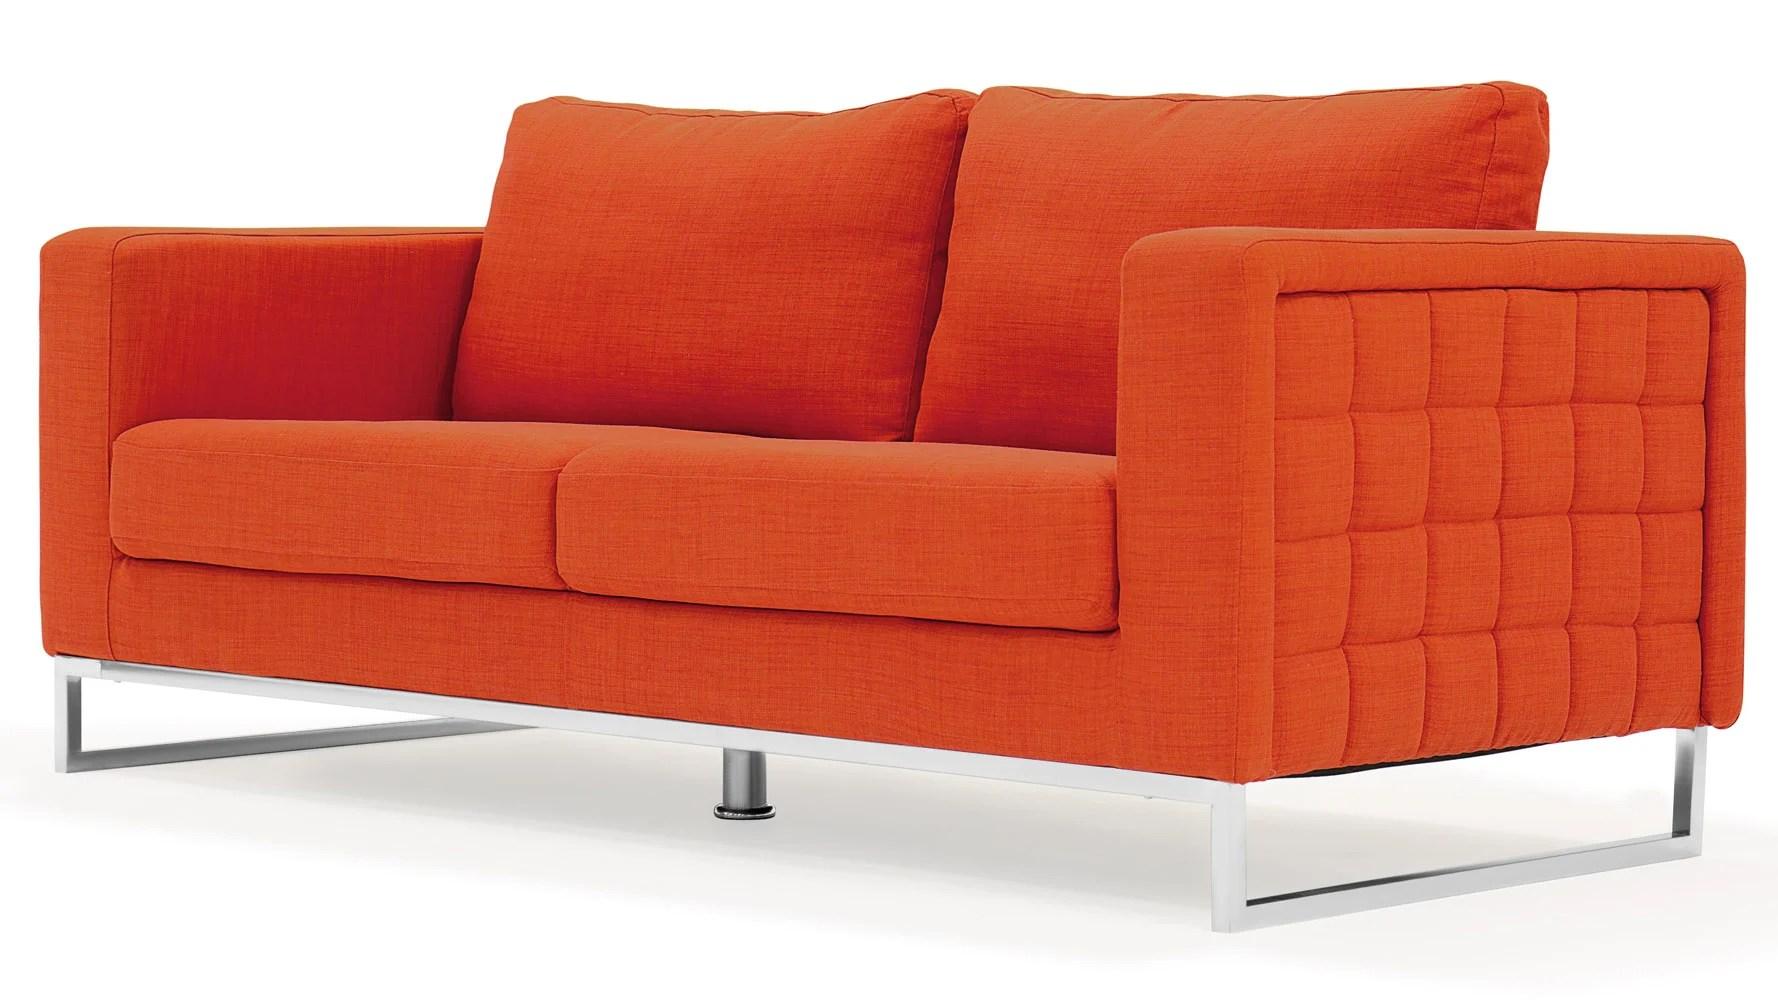 steel sofa set online chennai light grey corner uk modern orange fabric upholstered 2 piece with